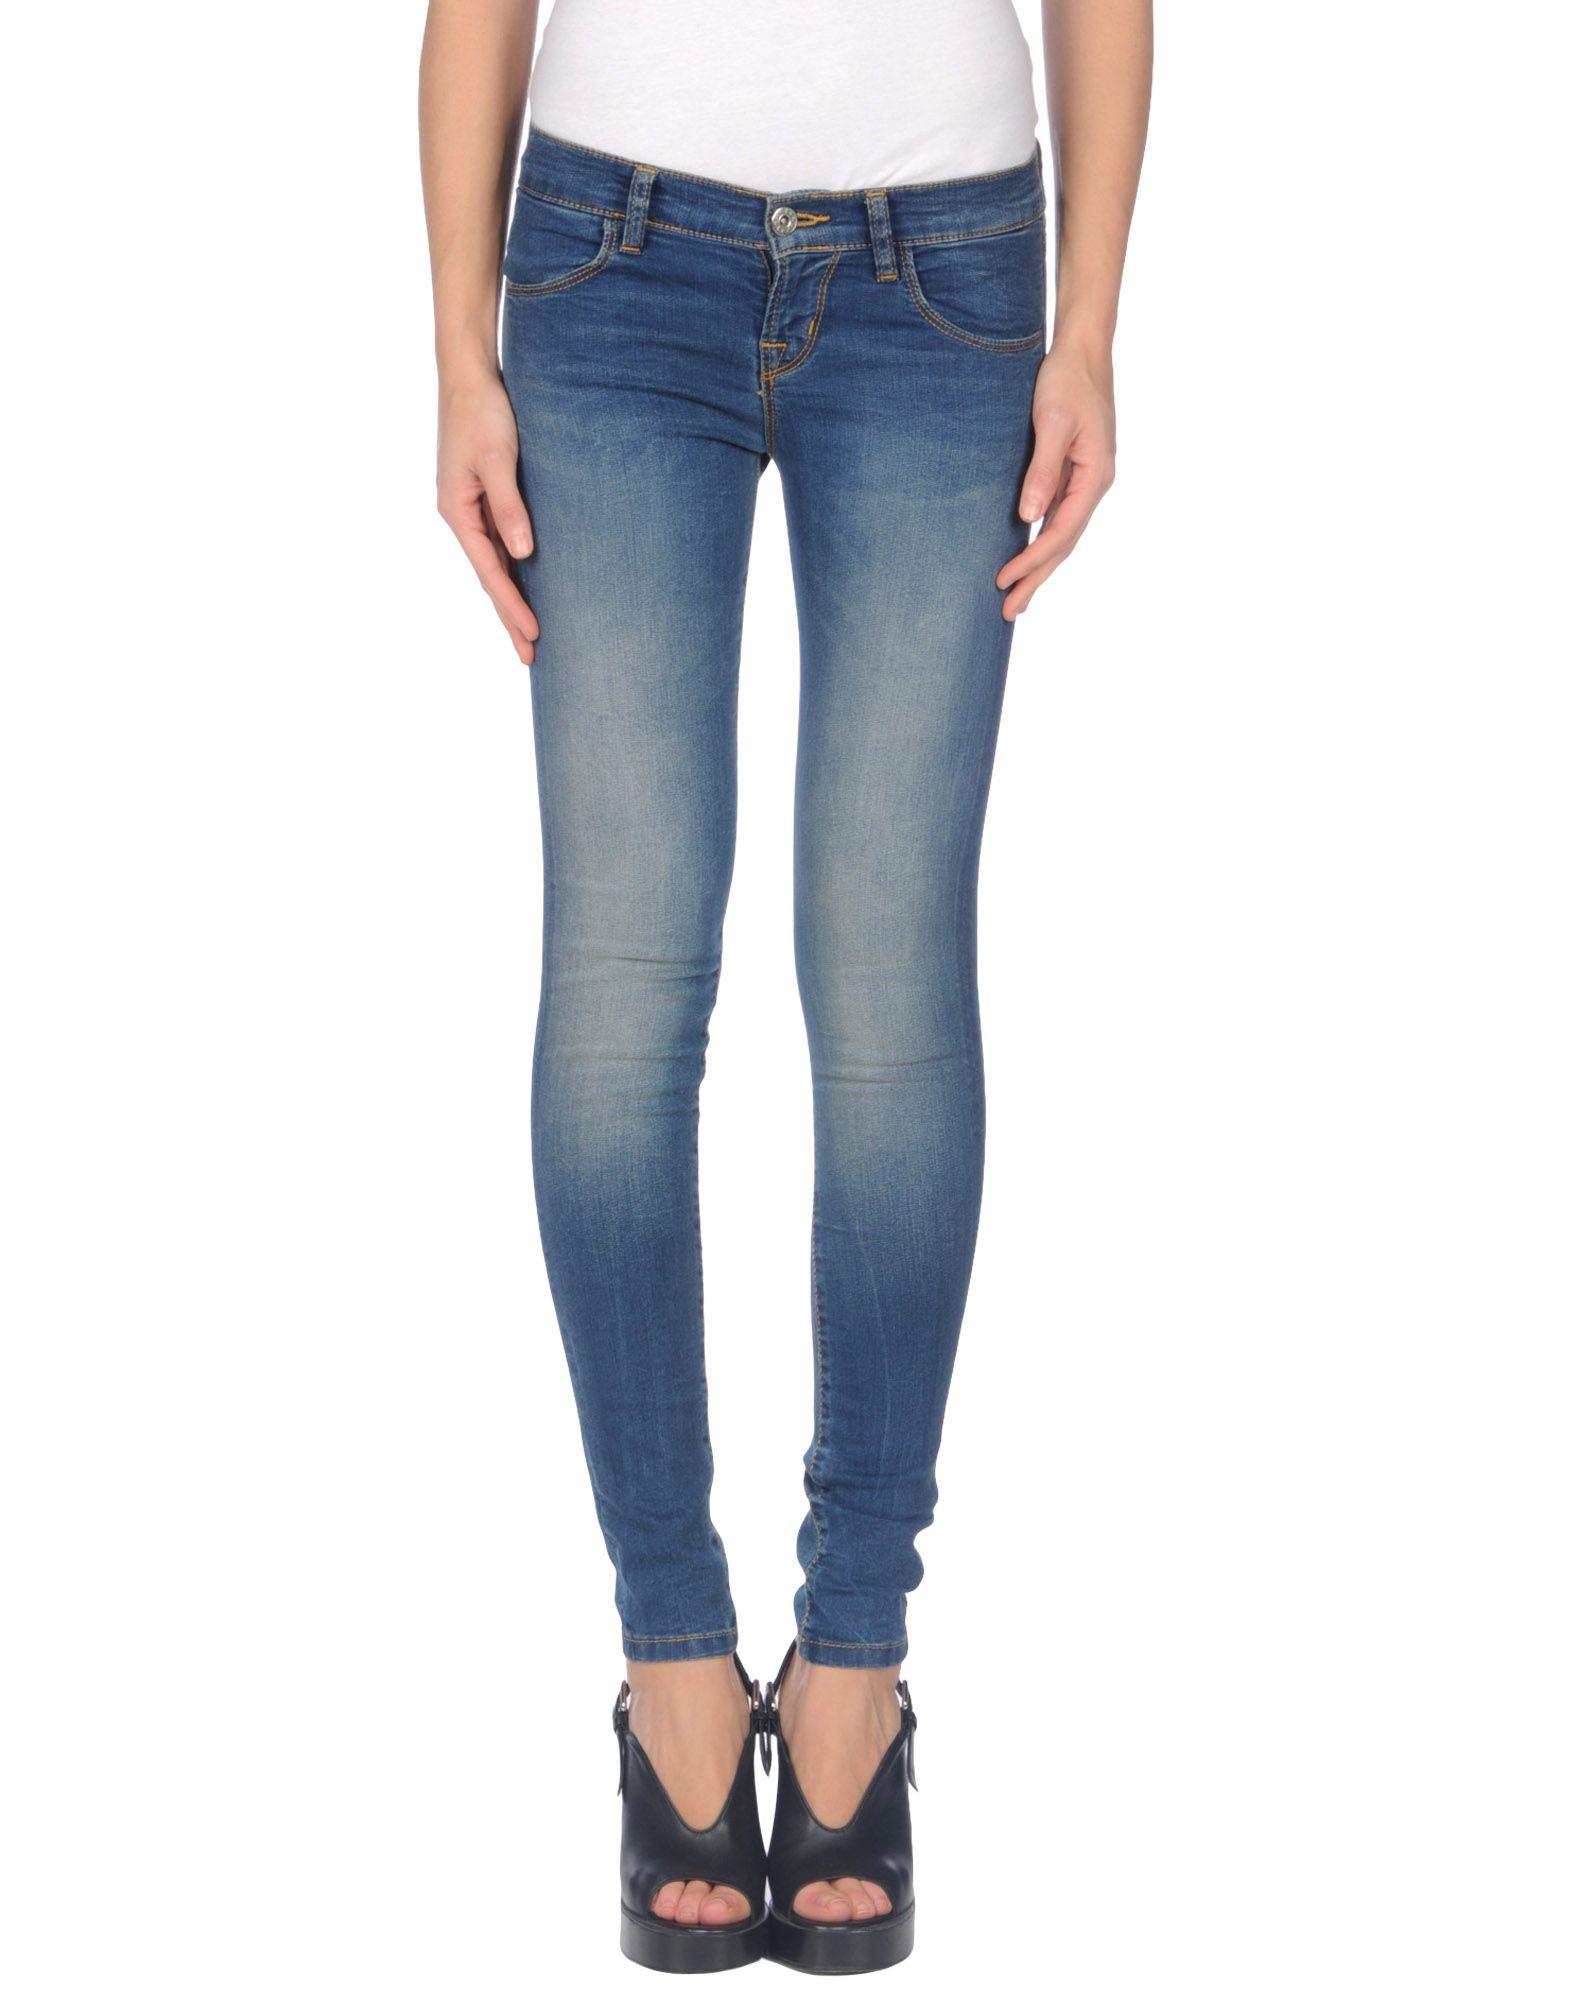 Pantaloni Jeans Brian Dales & Ltb donna - - 42568822UA